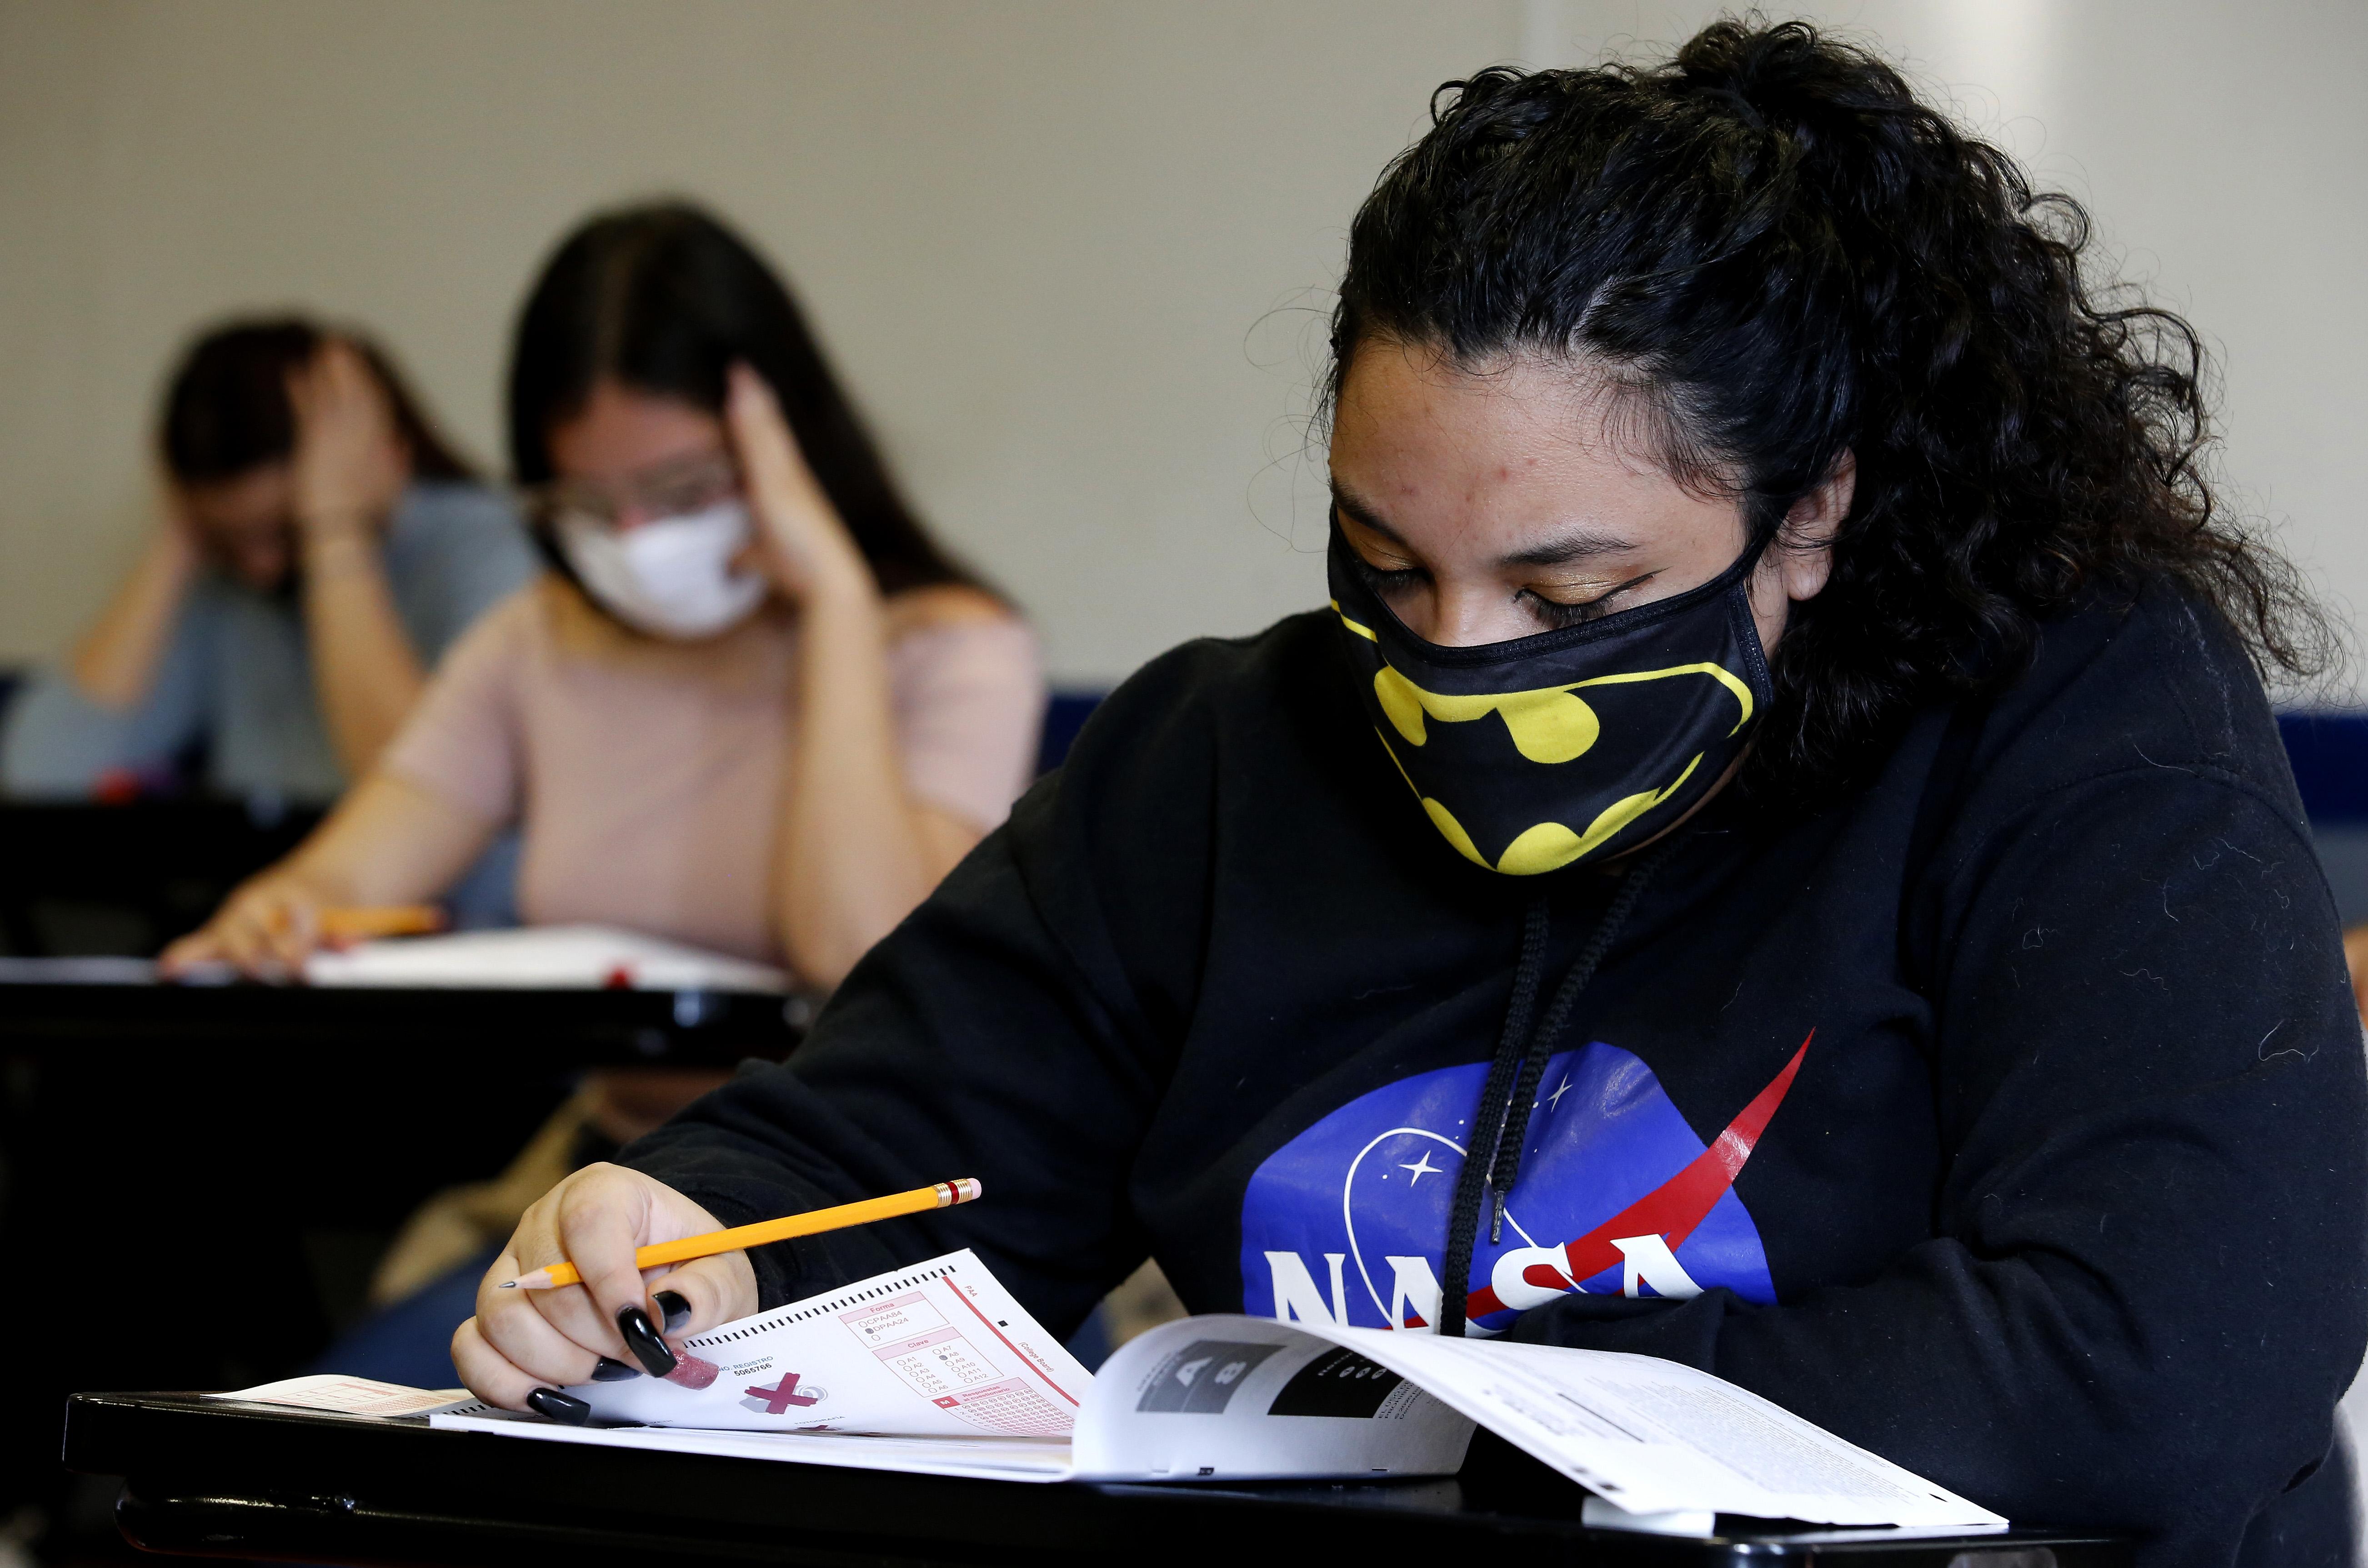 International student outlook bleak in return to Victoria, Australia by 2021